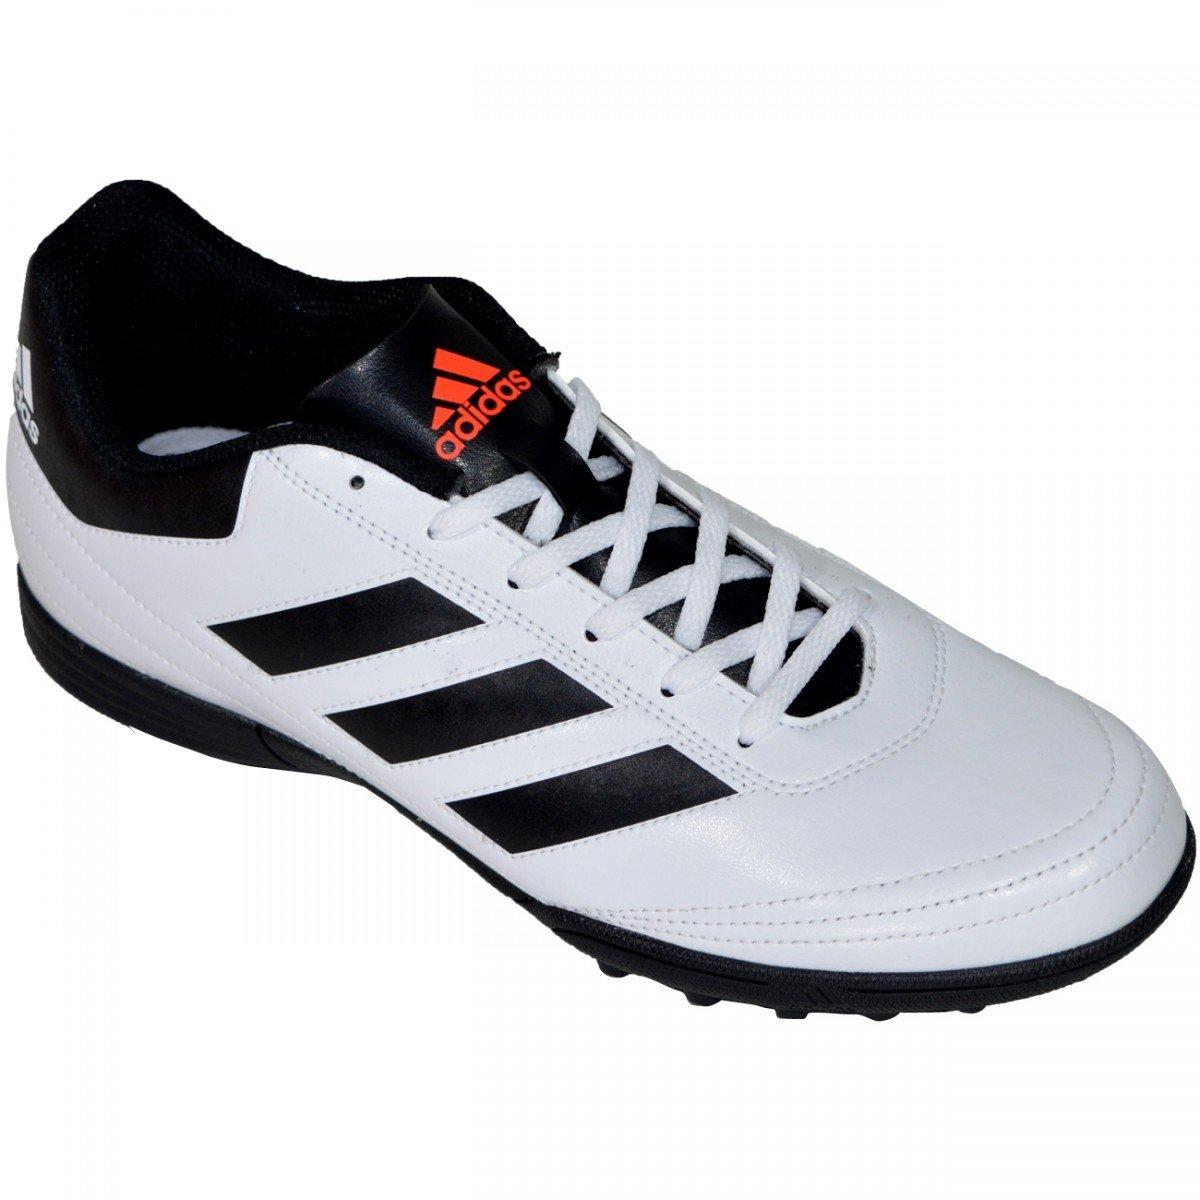 Chuteira Society Adidas Goletto VI - Compre Agora  1da9f348f7a2b